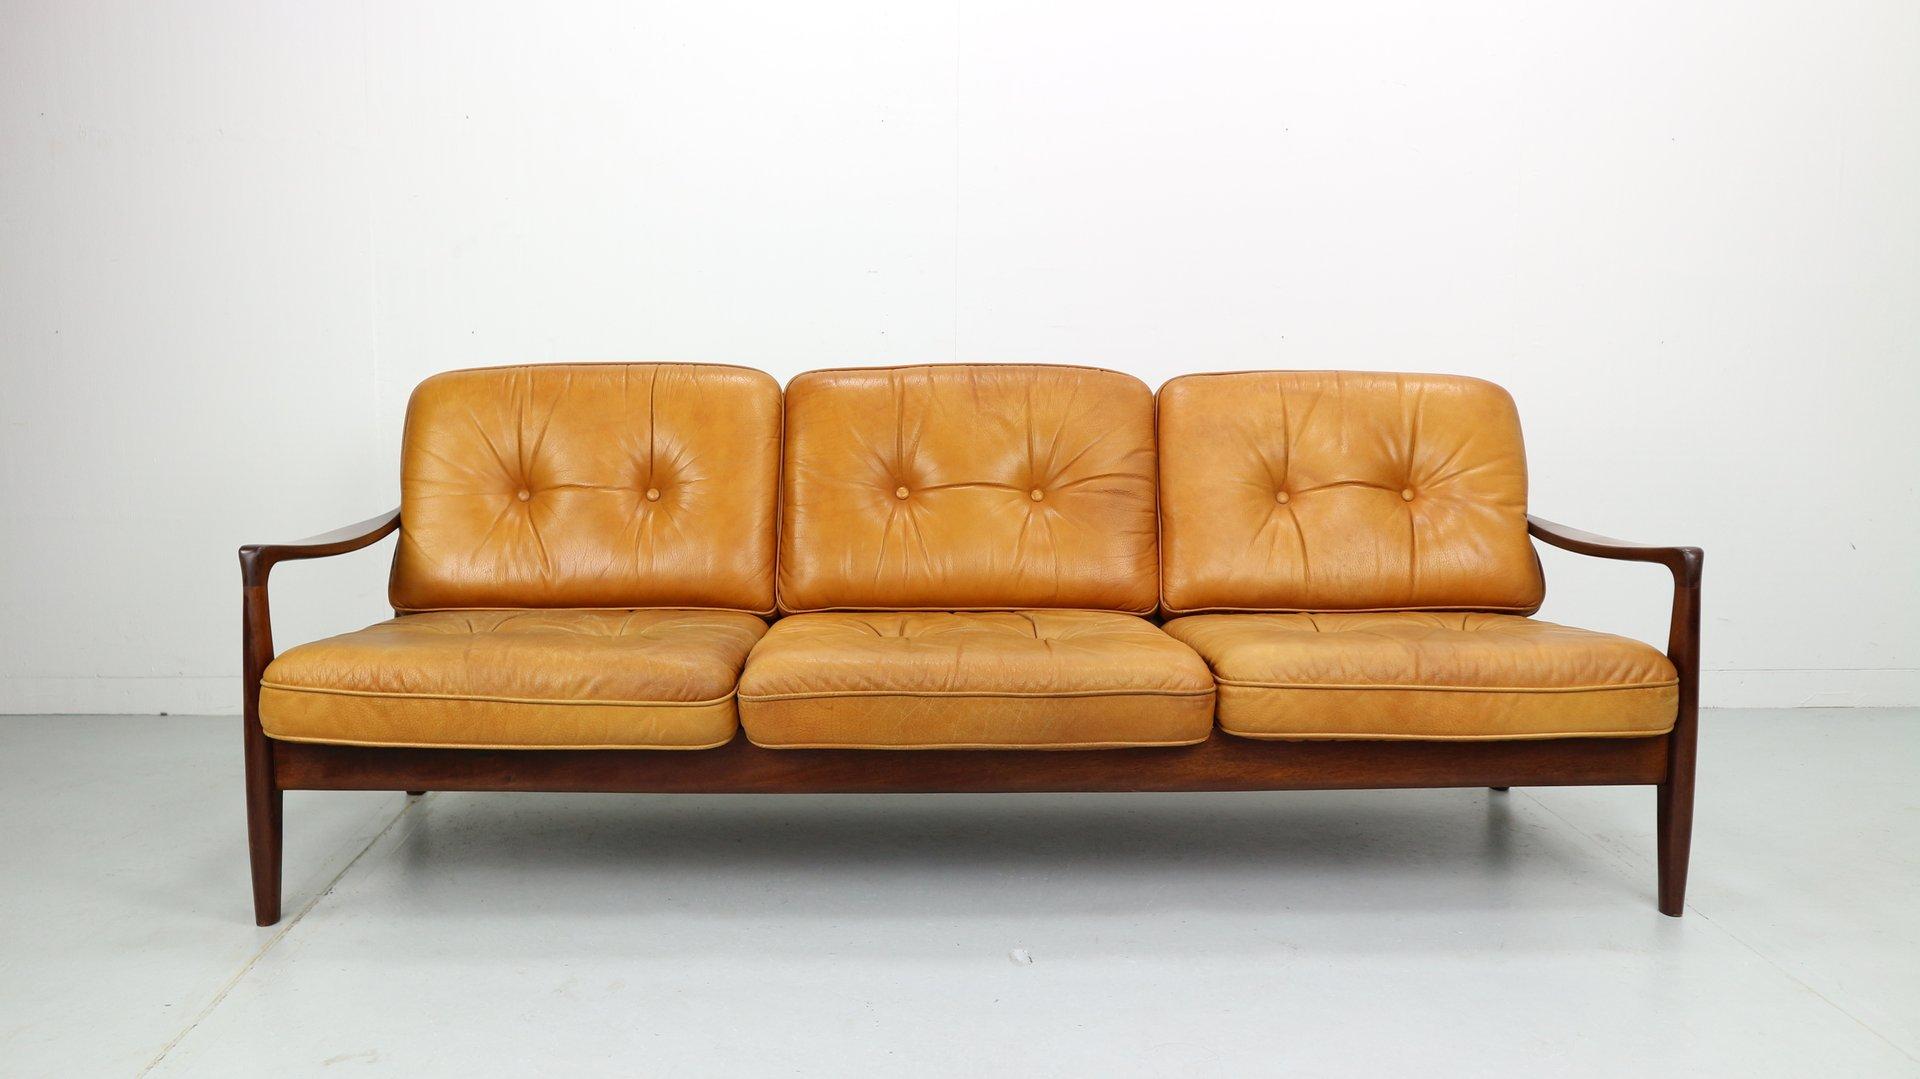 cognacfarbenes vintage 3 sitzer sofa aus leder 1960er haustechnik thiel. Black Bedroom Furniture Sets. Home Design Ideas